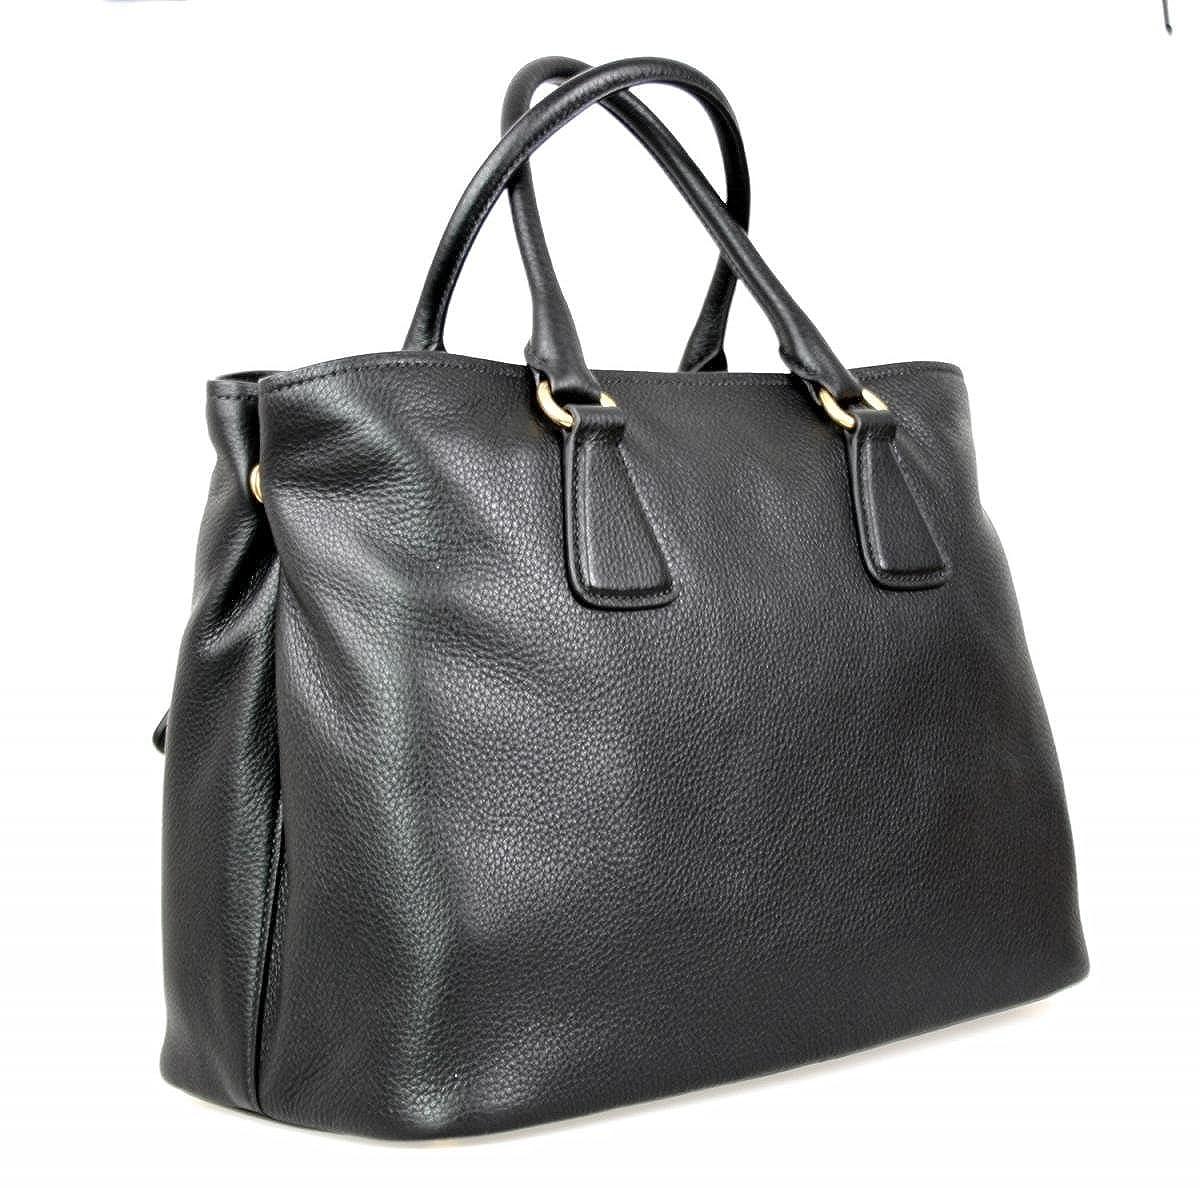 819ae1ab Prada Women's 1BA794 UWL F0002 Black Leather Shoulder Bag: Handbags ...